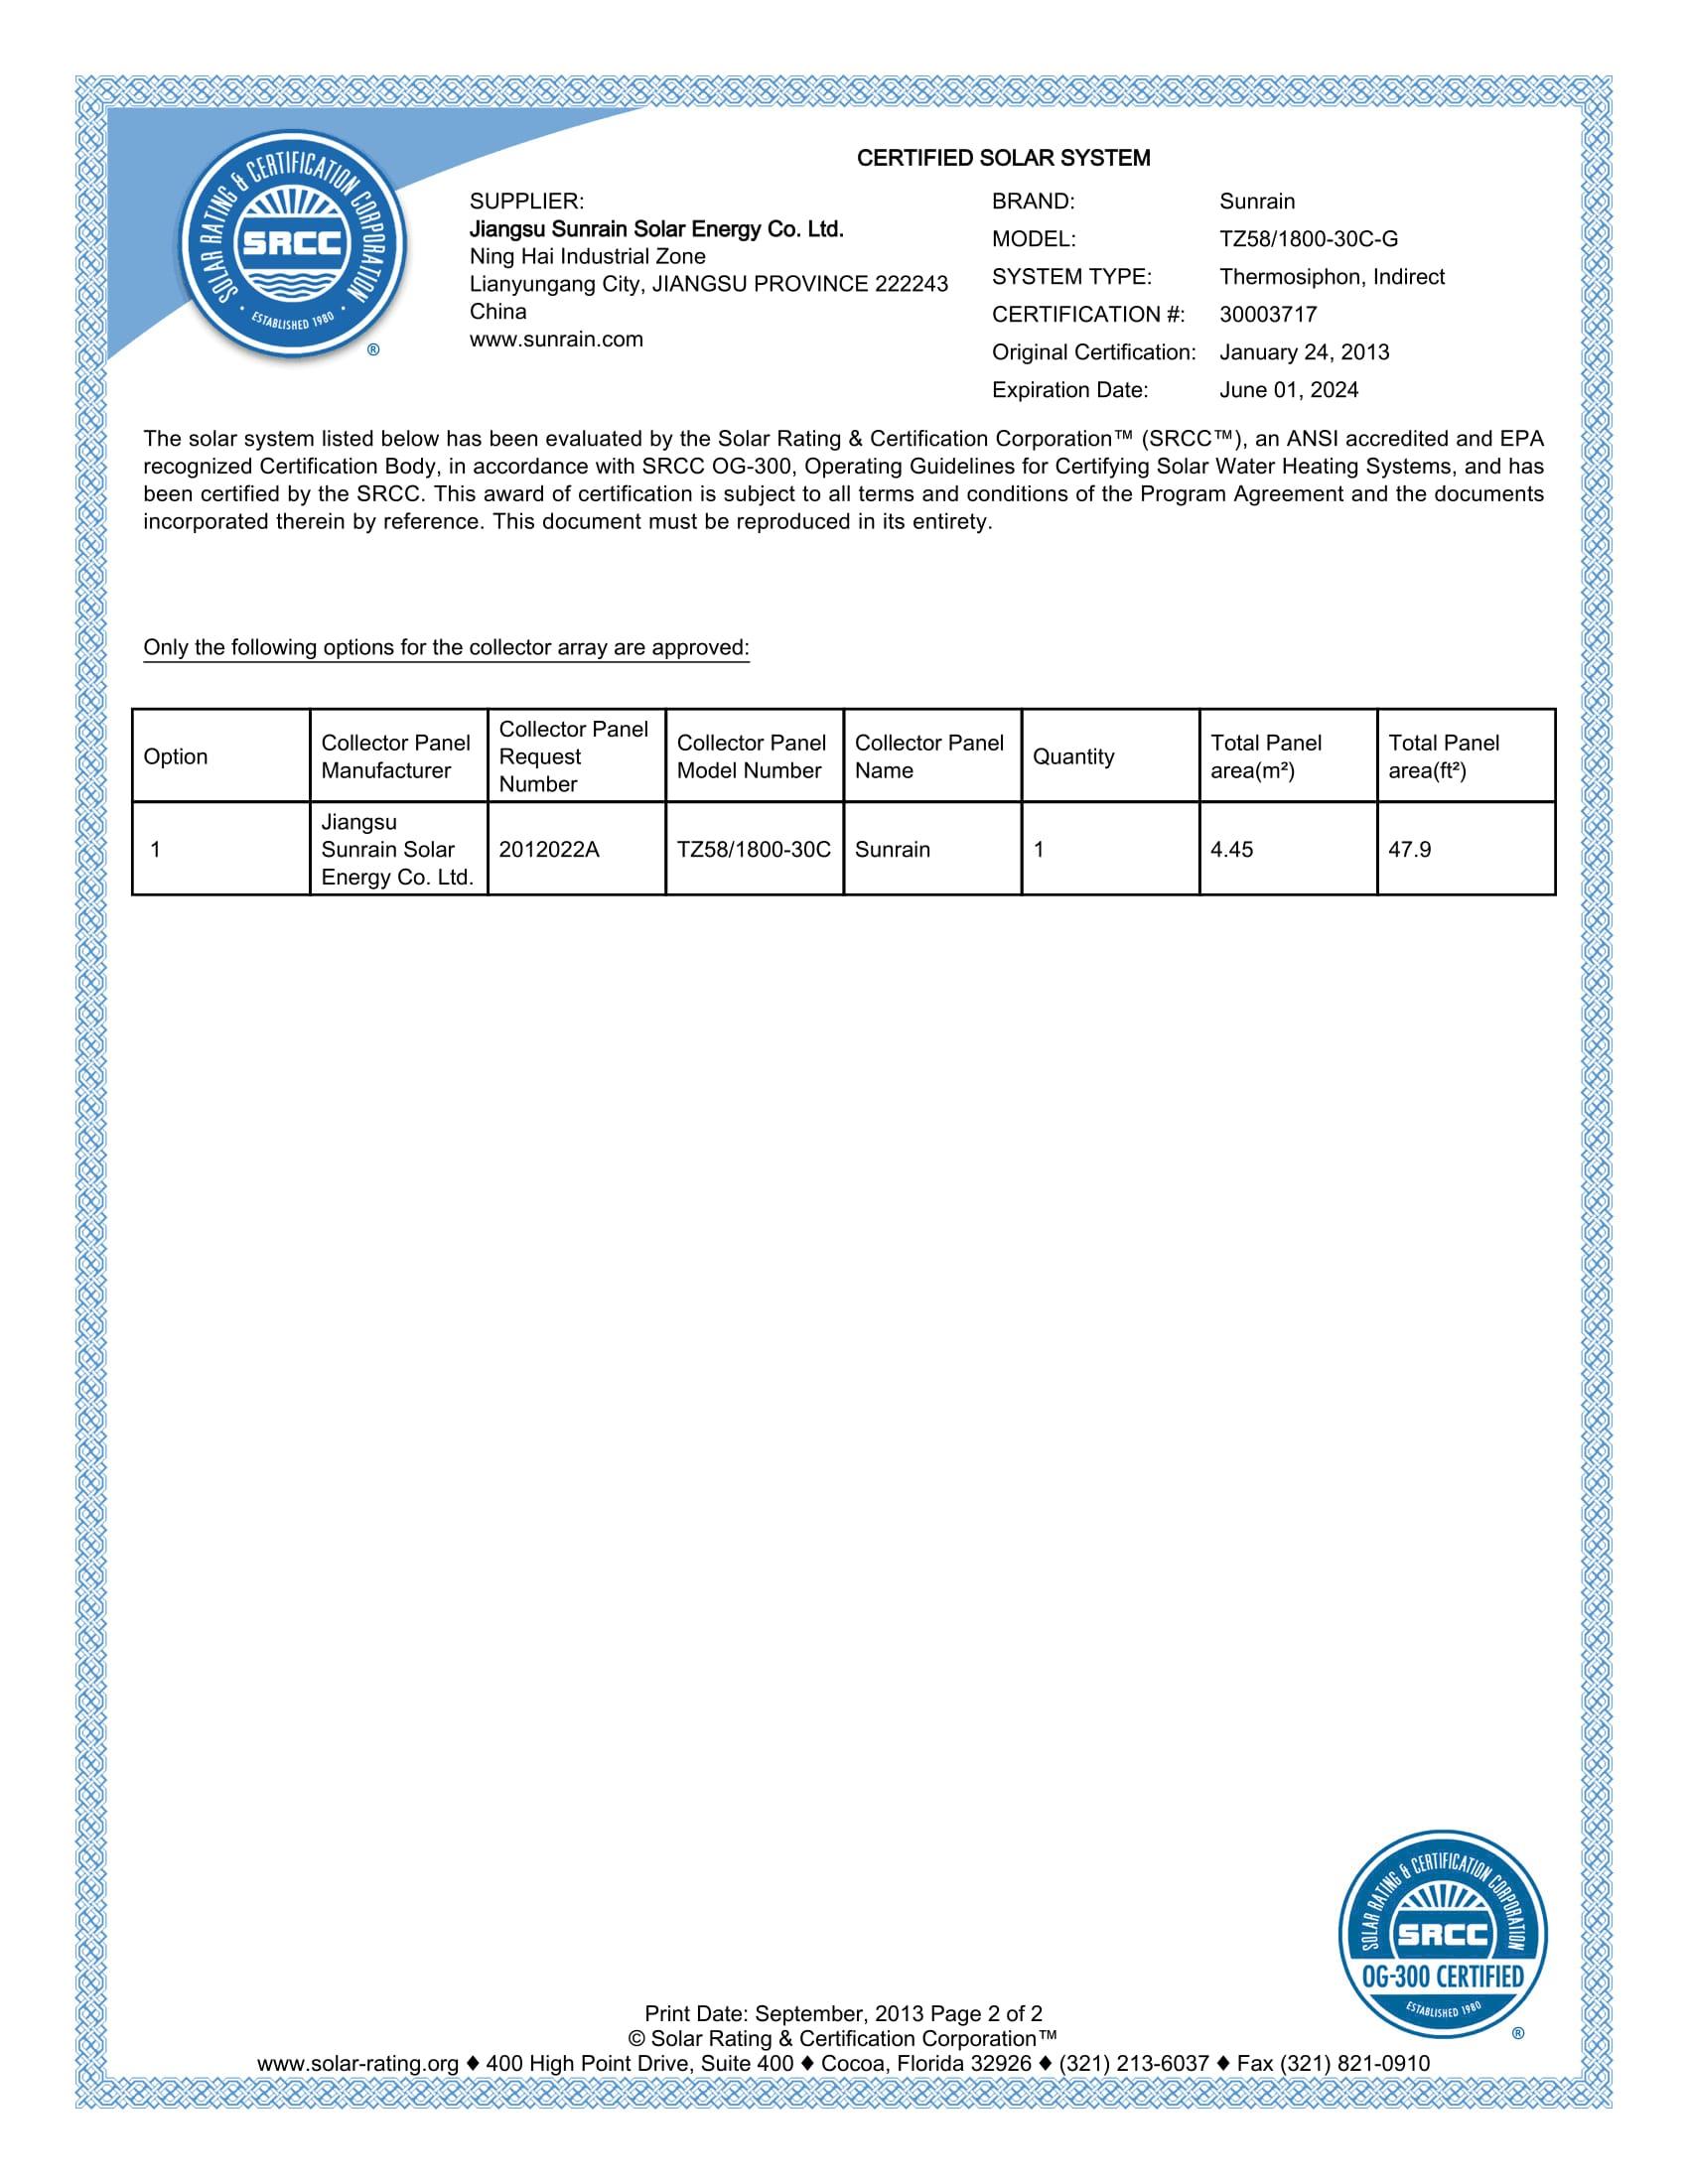 SRCC 30g Report